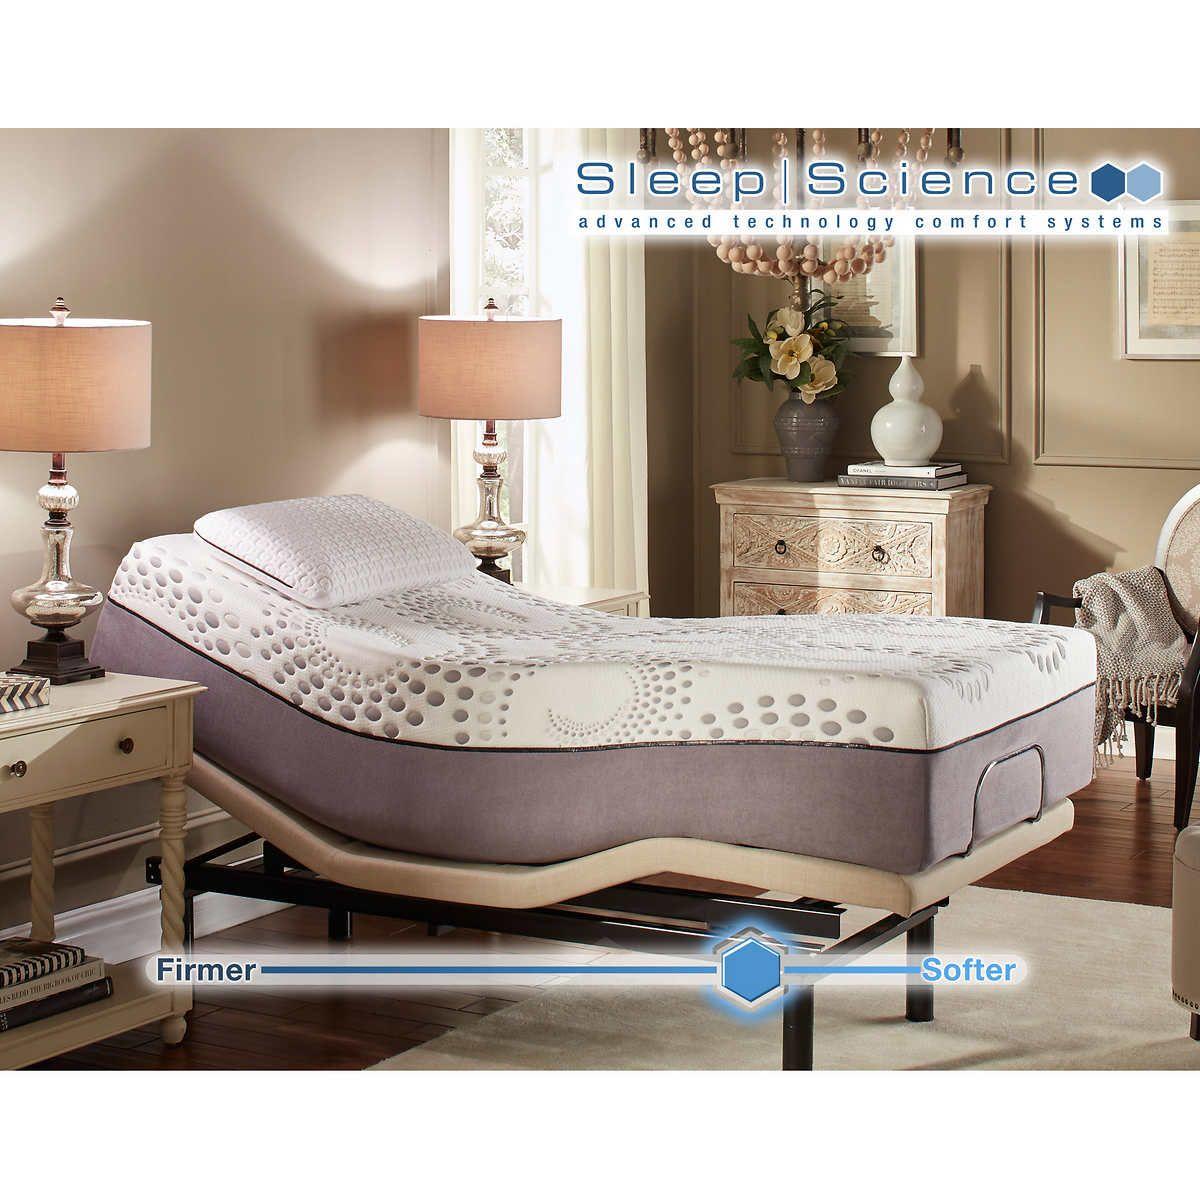 Sleep Science Mattress >> Sleep Science Ara 13 Twin Xl Memory Foam Mattress With